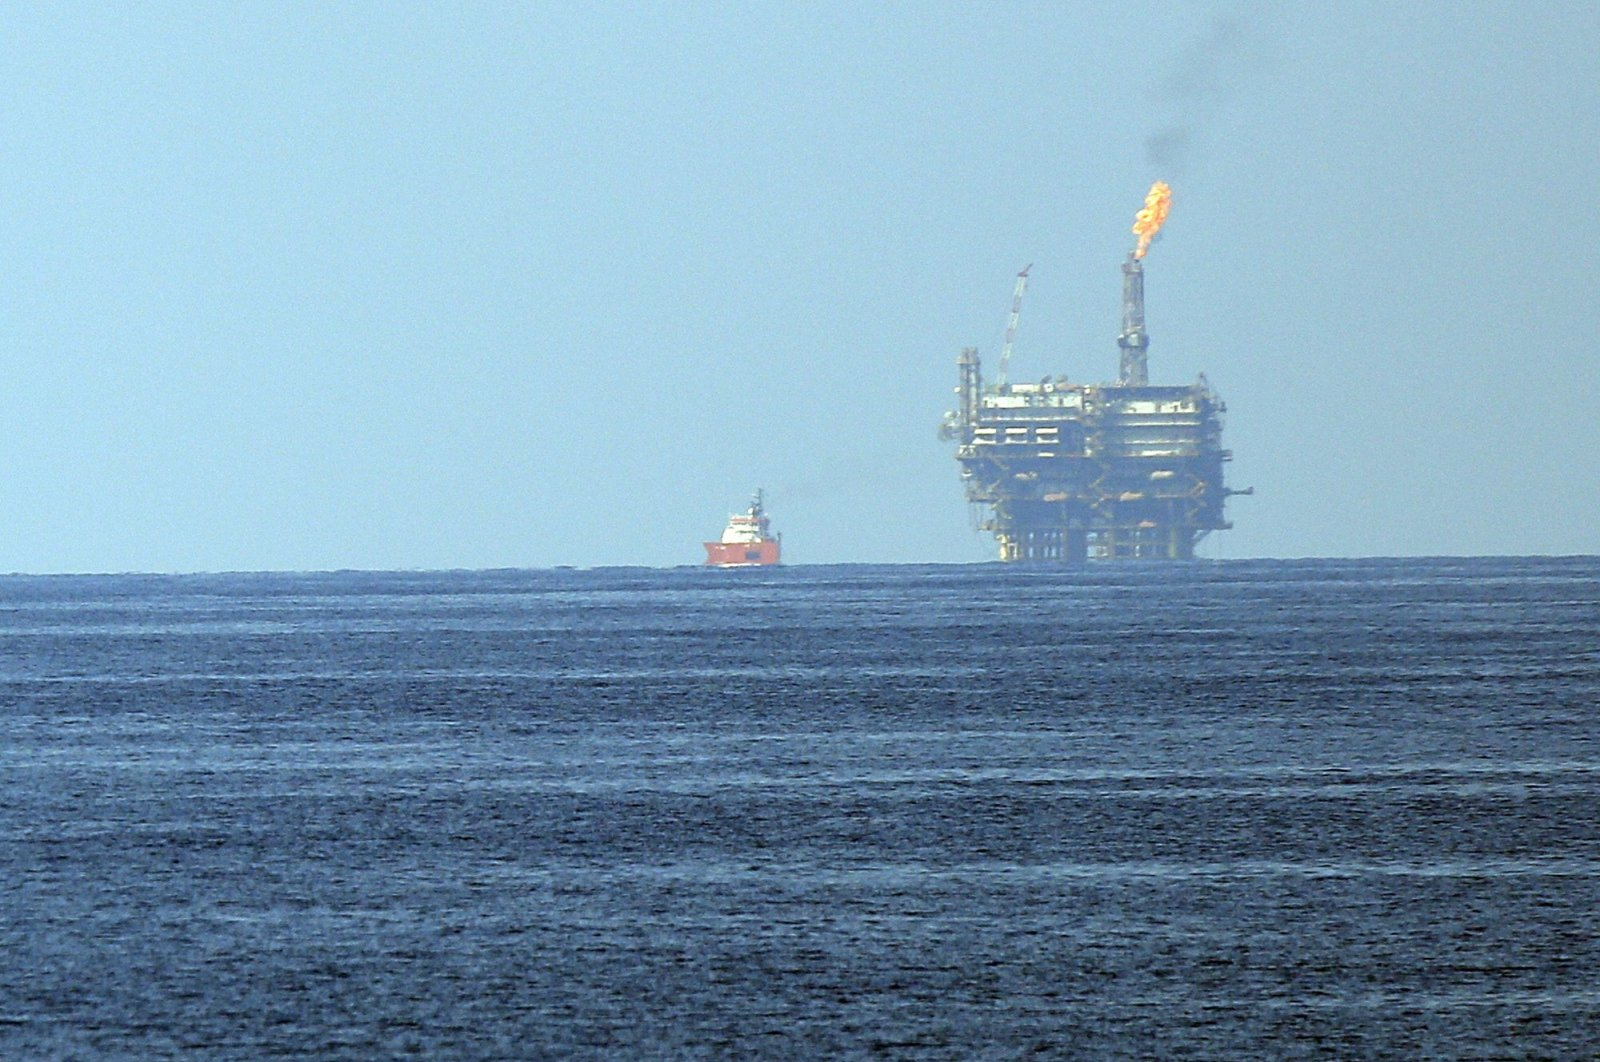 Eni's Bouri Offshore oil terminal is seen off the Libyan coast, in the Mediterranean Sea, Aug. 1, 2015. (AP Photo)